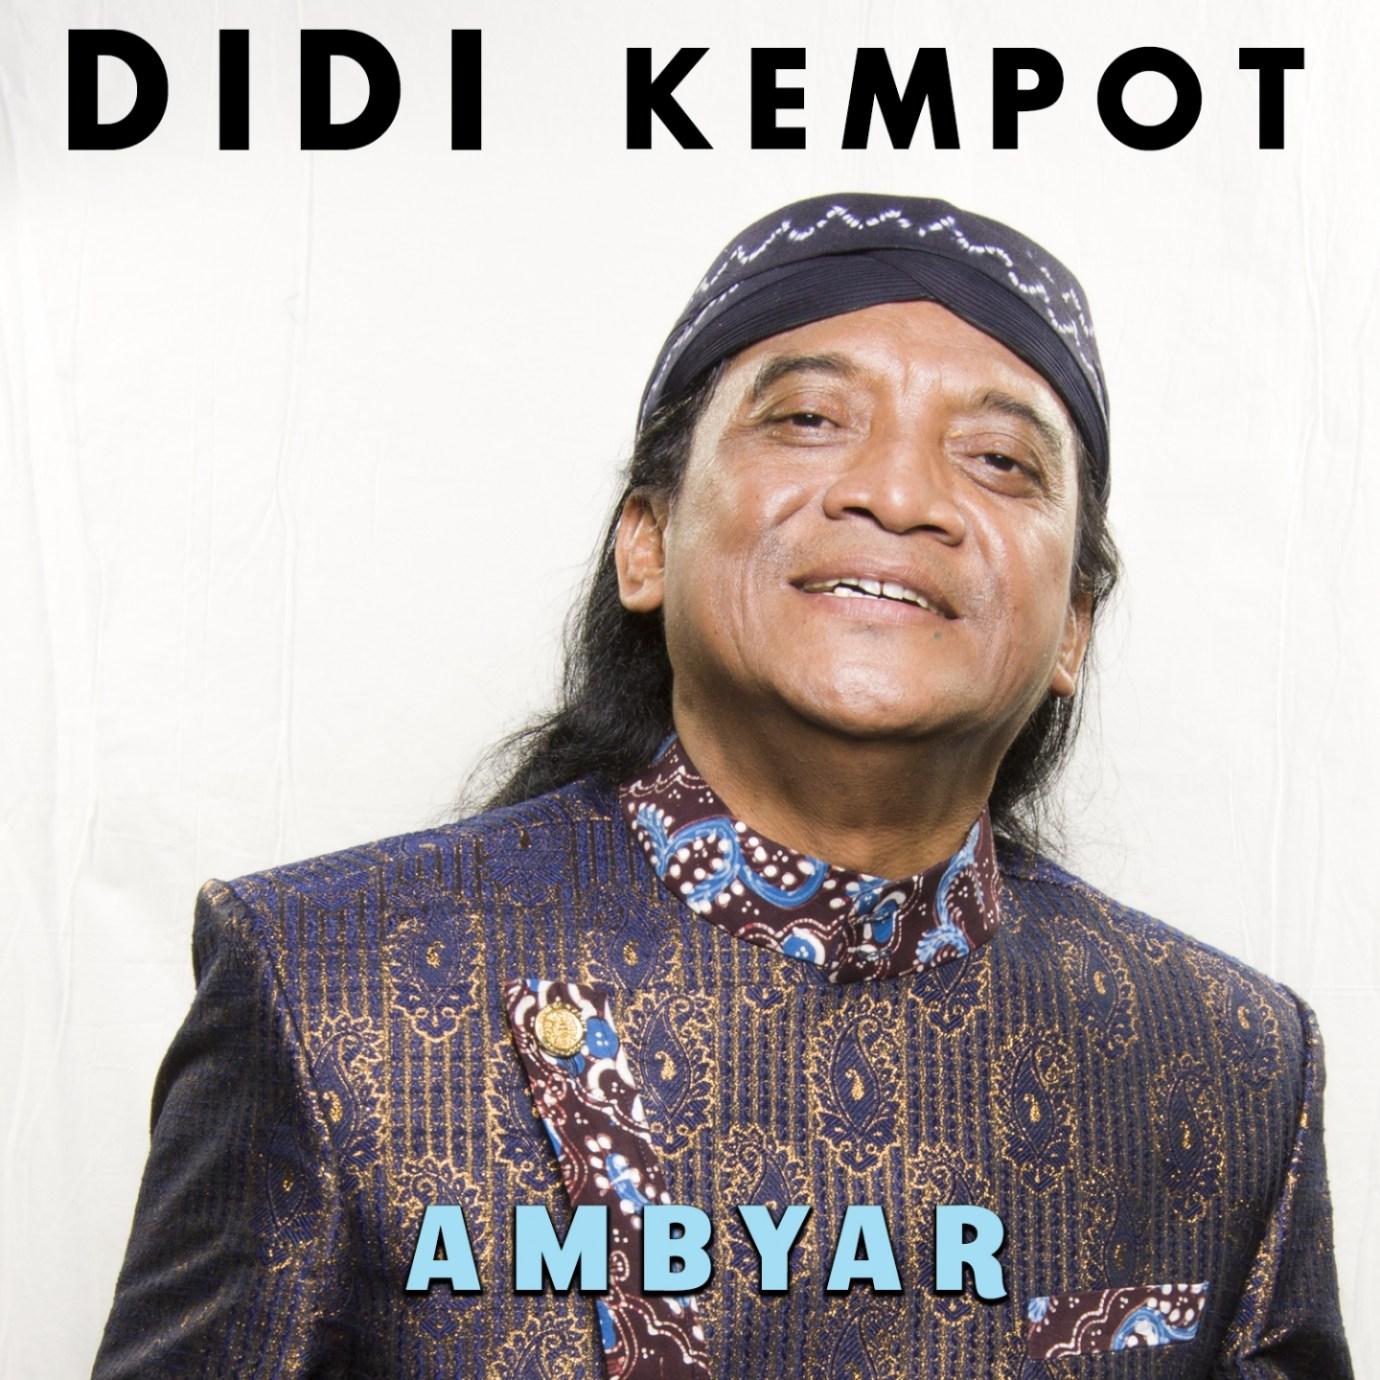 Listen Free To Didi Kempot Ambyar Radio Iheartradio